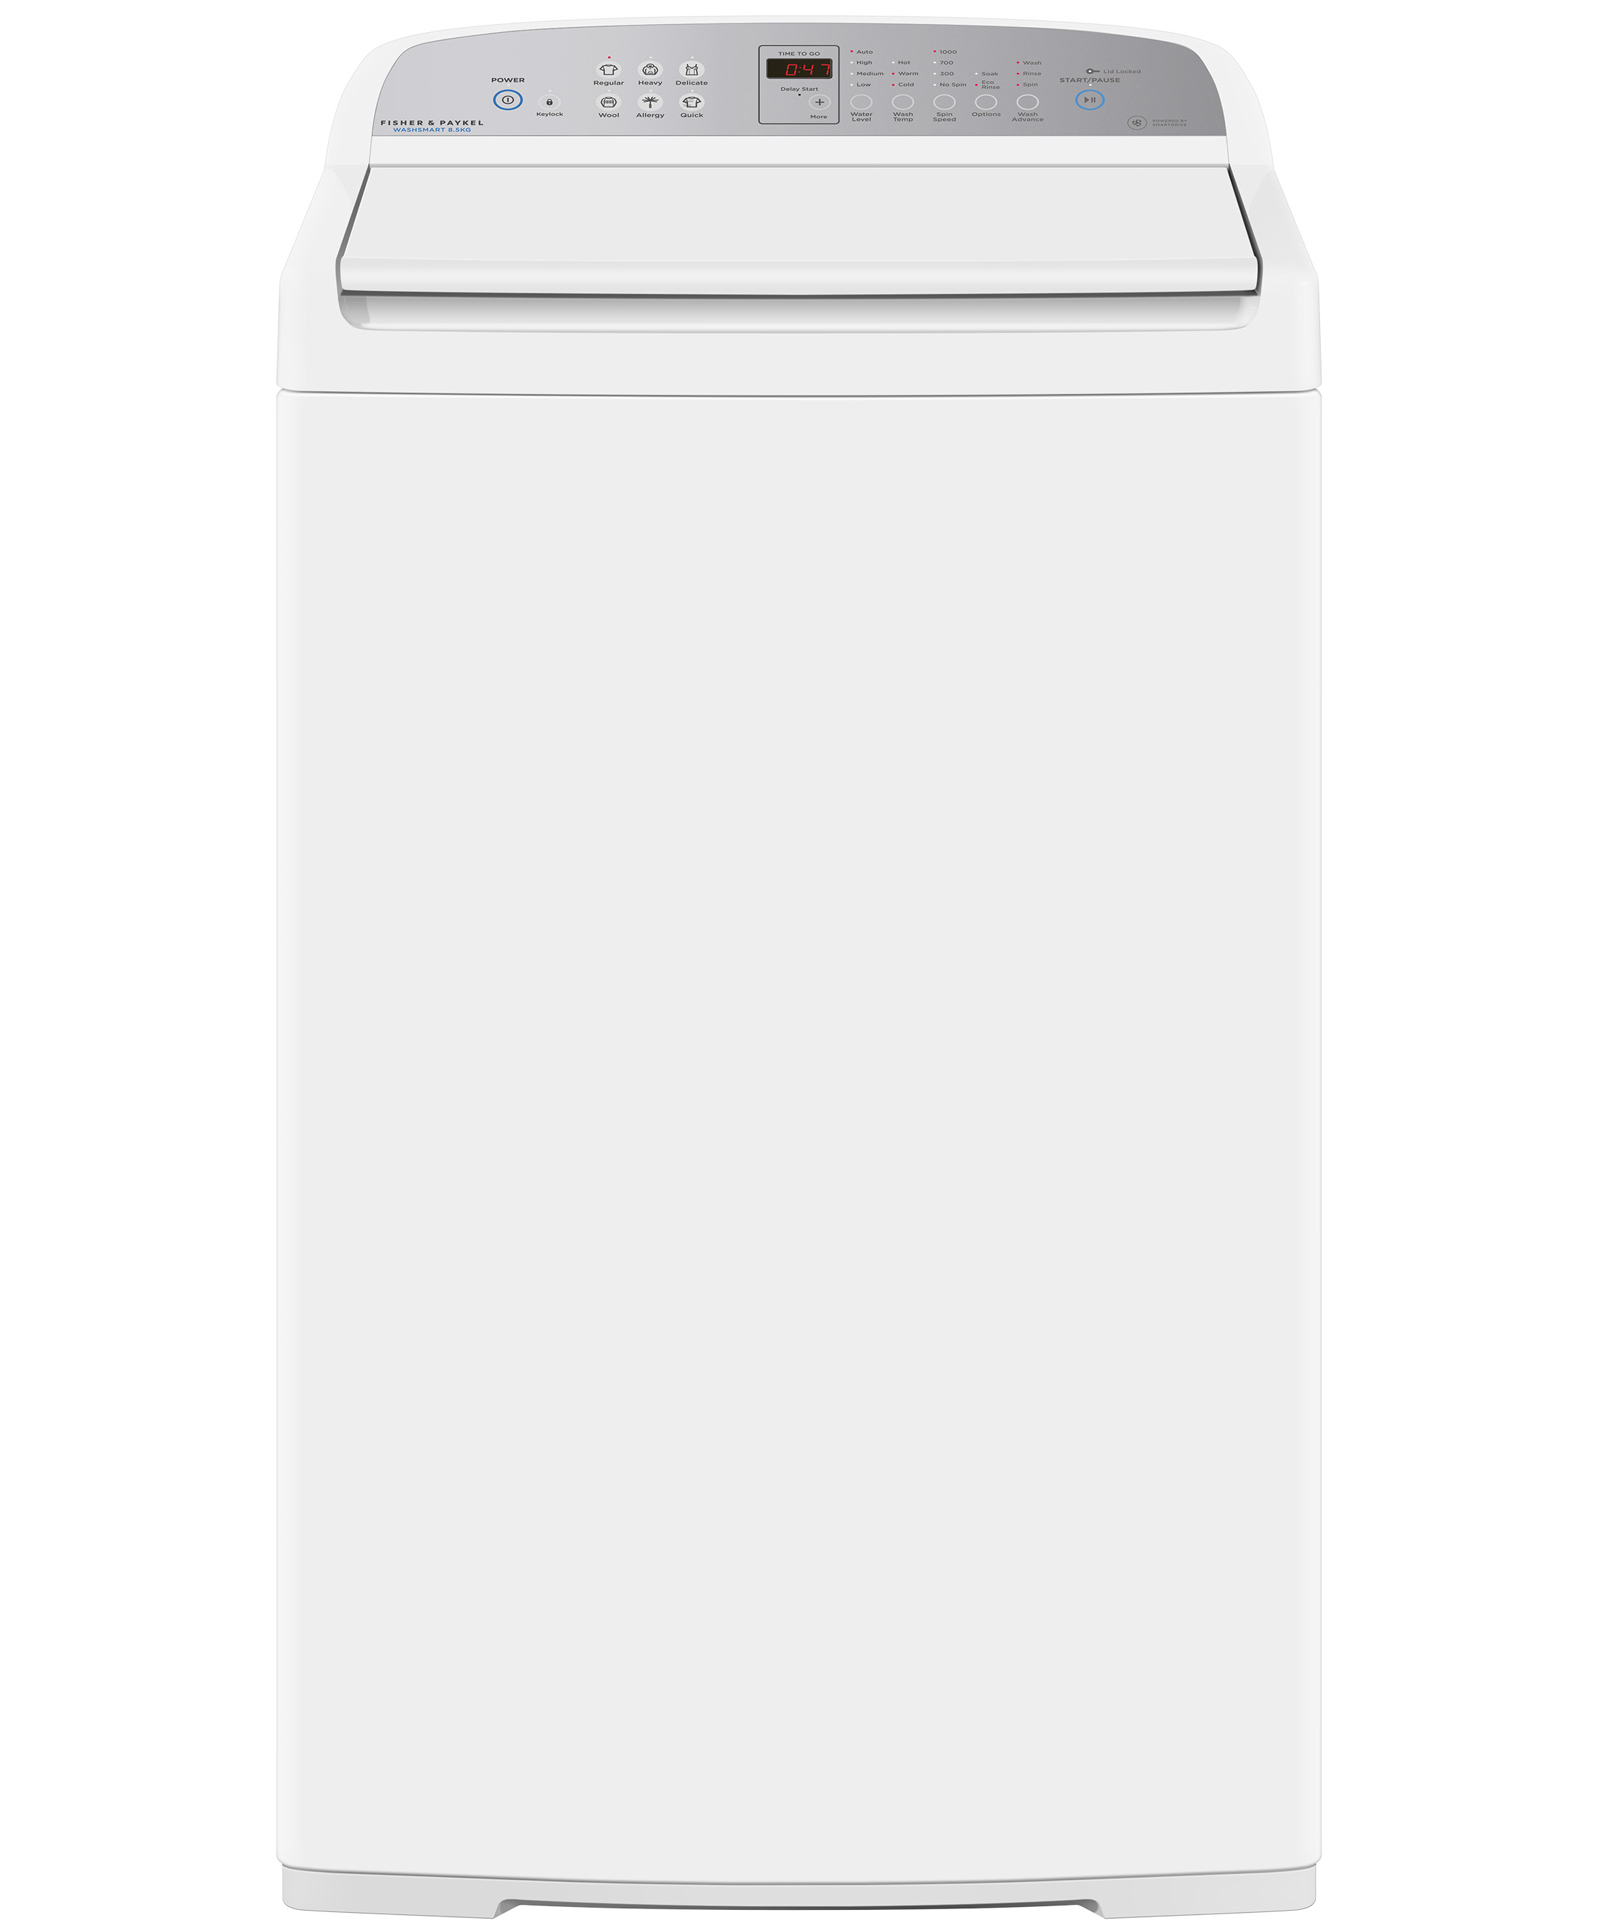 Wa8560g1 8 5kg Top Loader Washing Machine Fisher